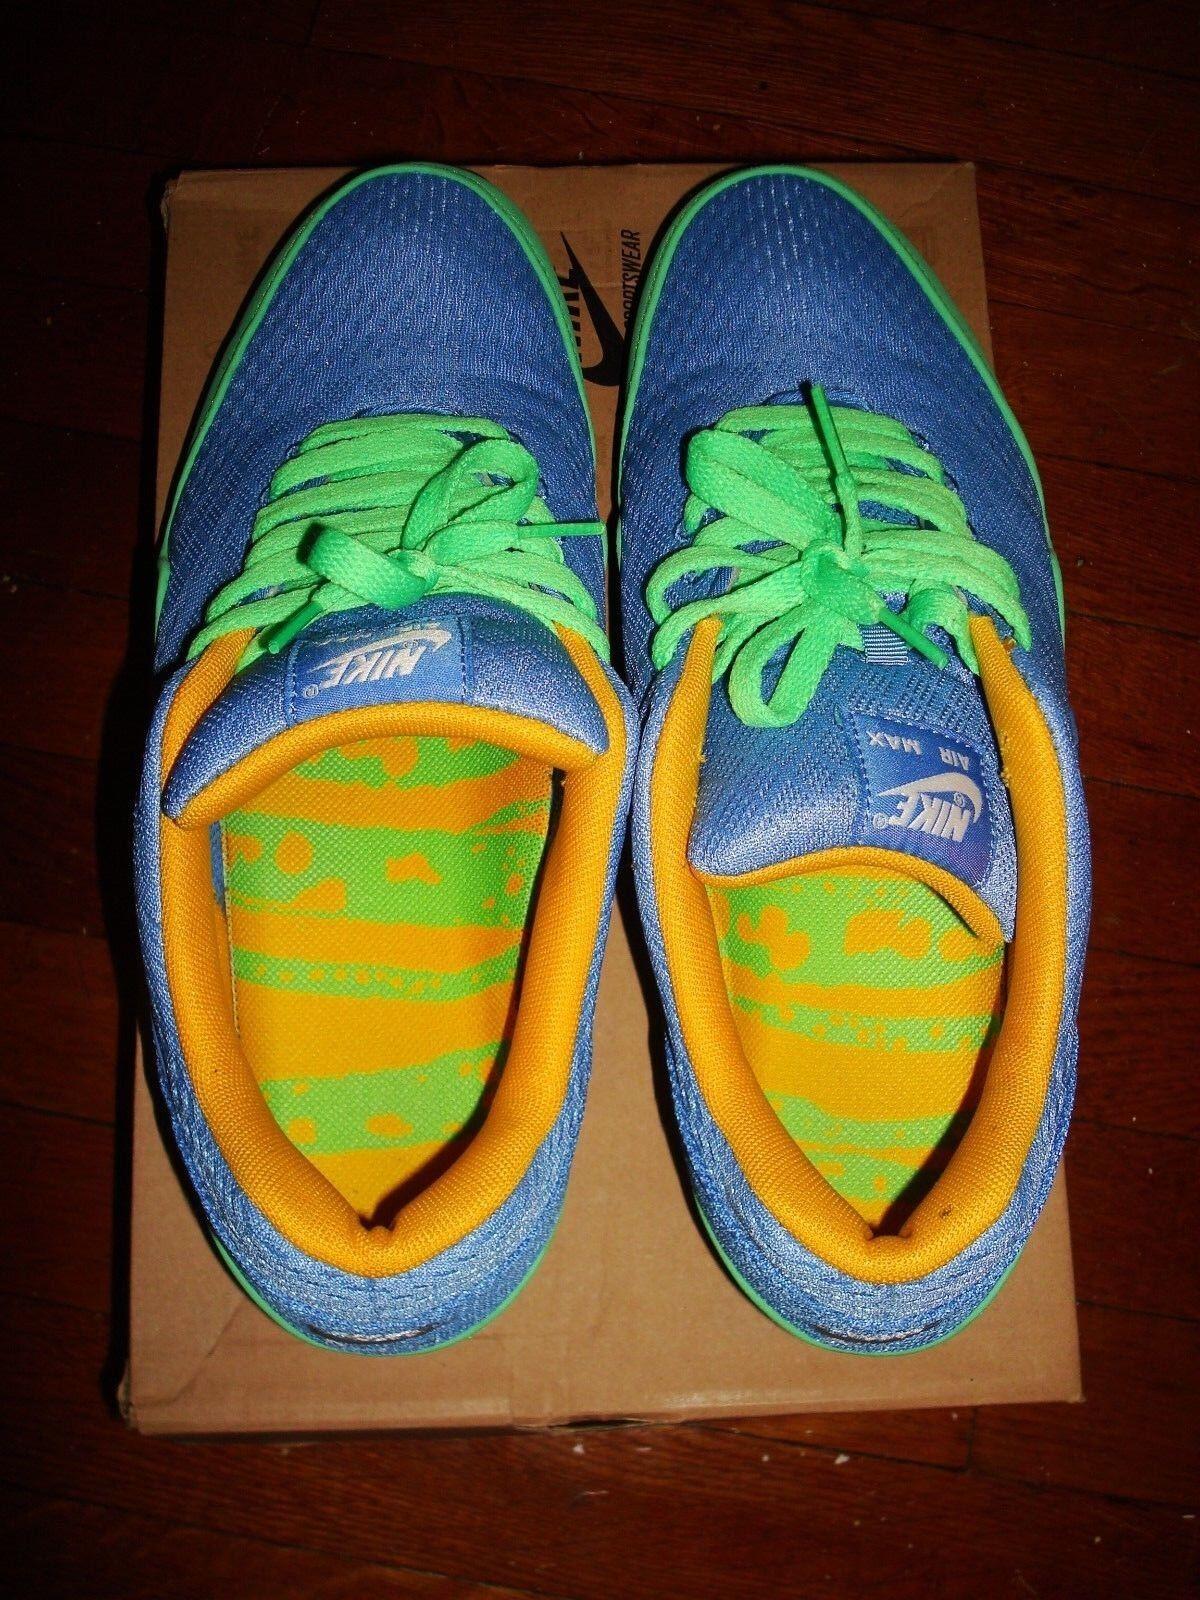 Nike Air Max 1 EM   da Ginnastica/ Ginnastica/ Ginnastica/   10.5/ Green, Blue, Yellow/ 554718 443 66af66